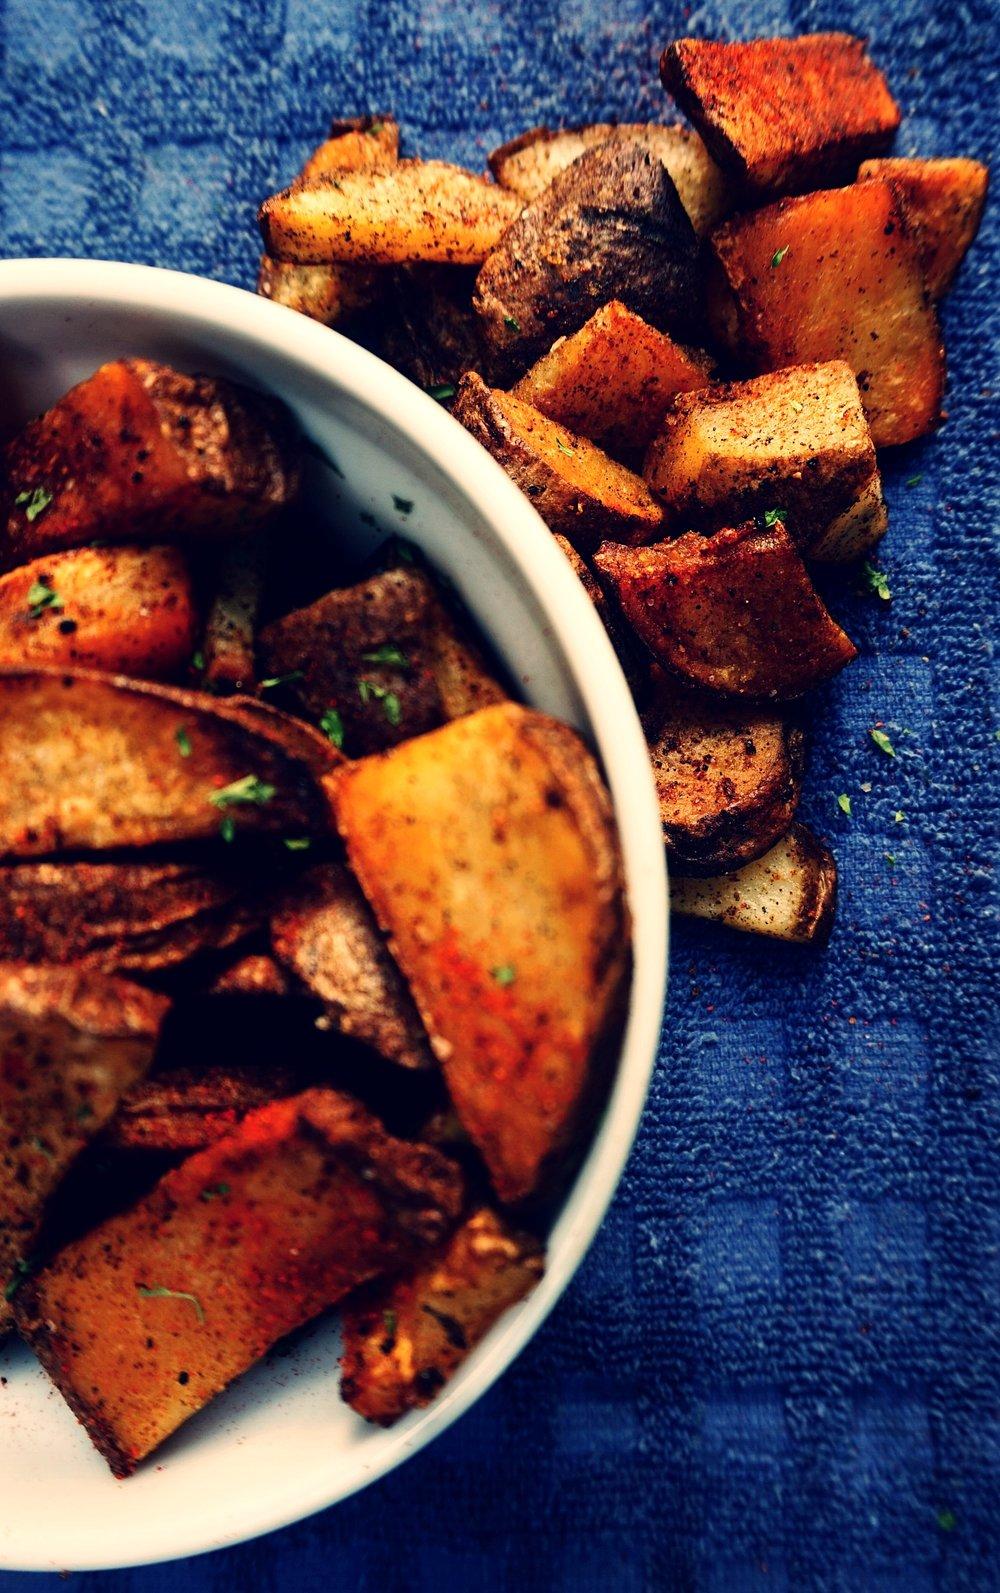 Crispy seasoned fried potatoes